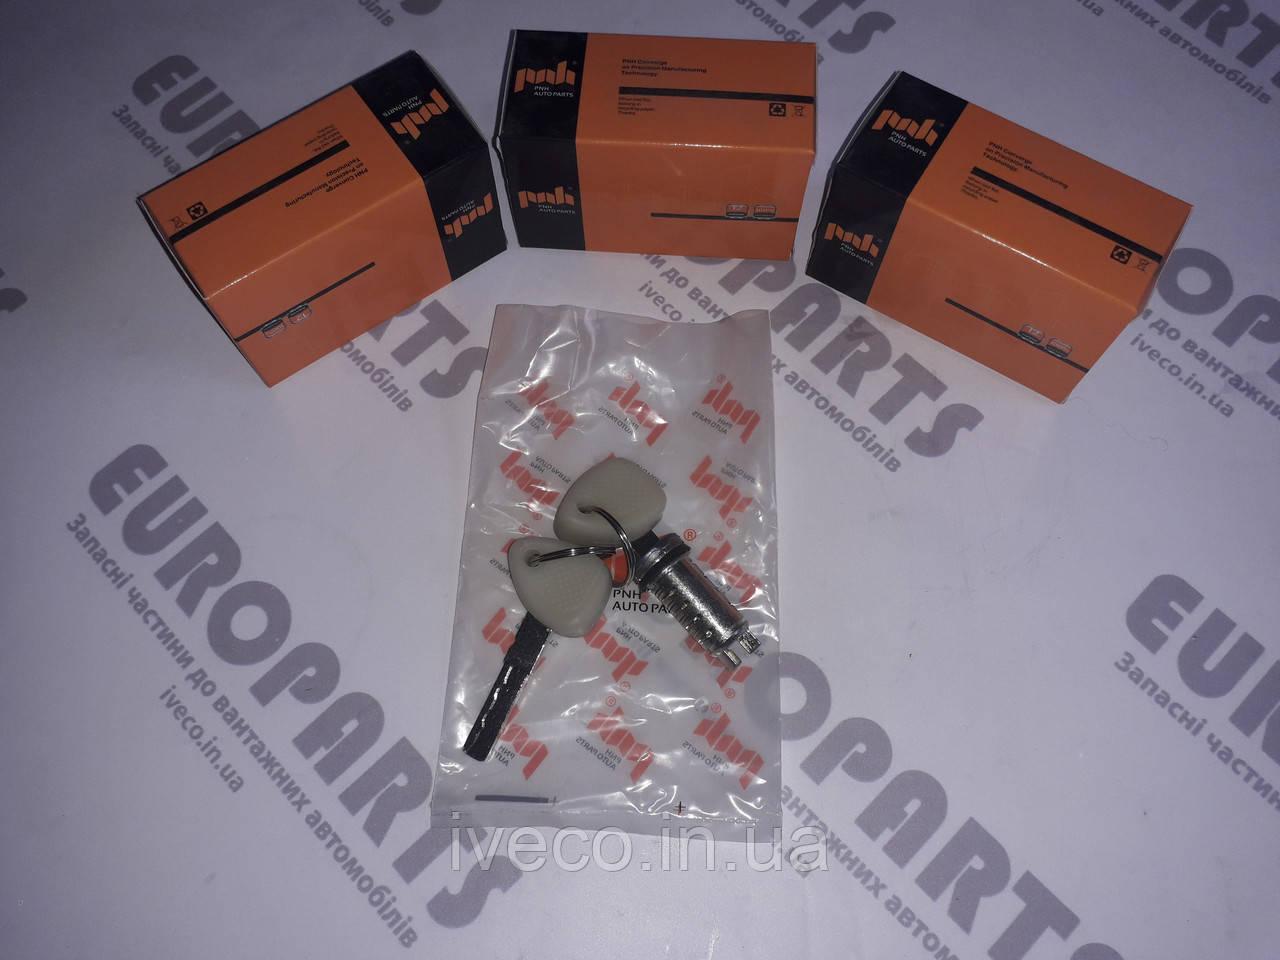 Личинка замка двери с ключами Iveco Stralis Trakker Eurocargo Ивеко 2992664 замок двери  серцевина ручки двери